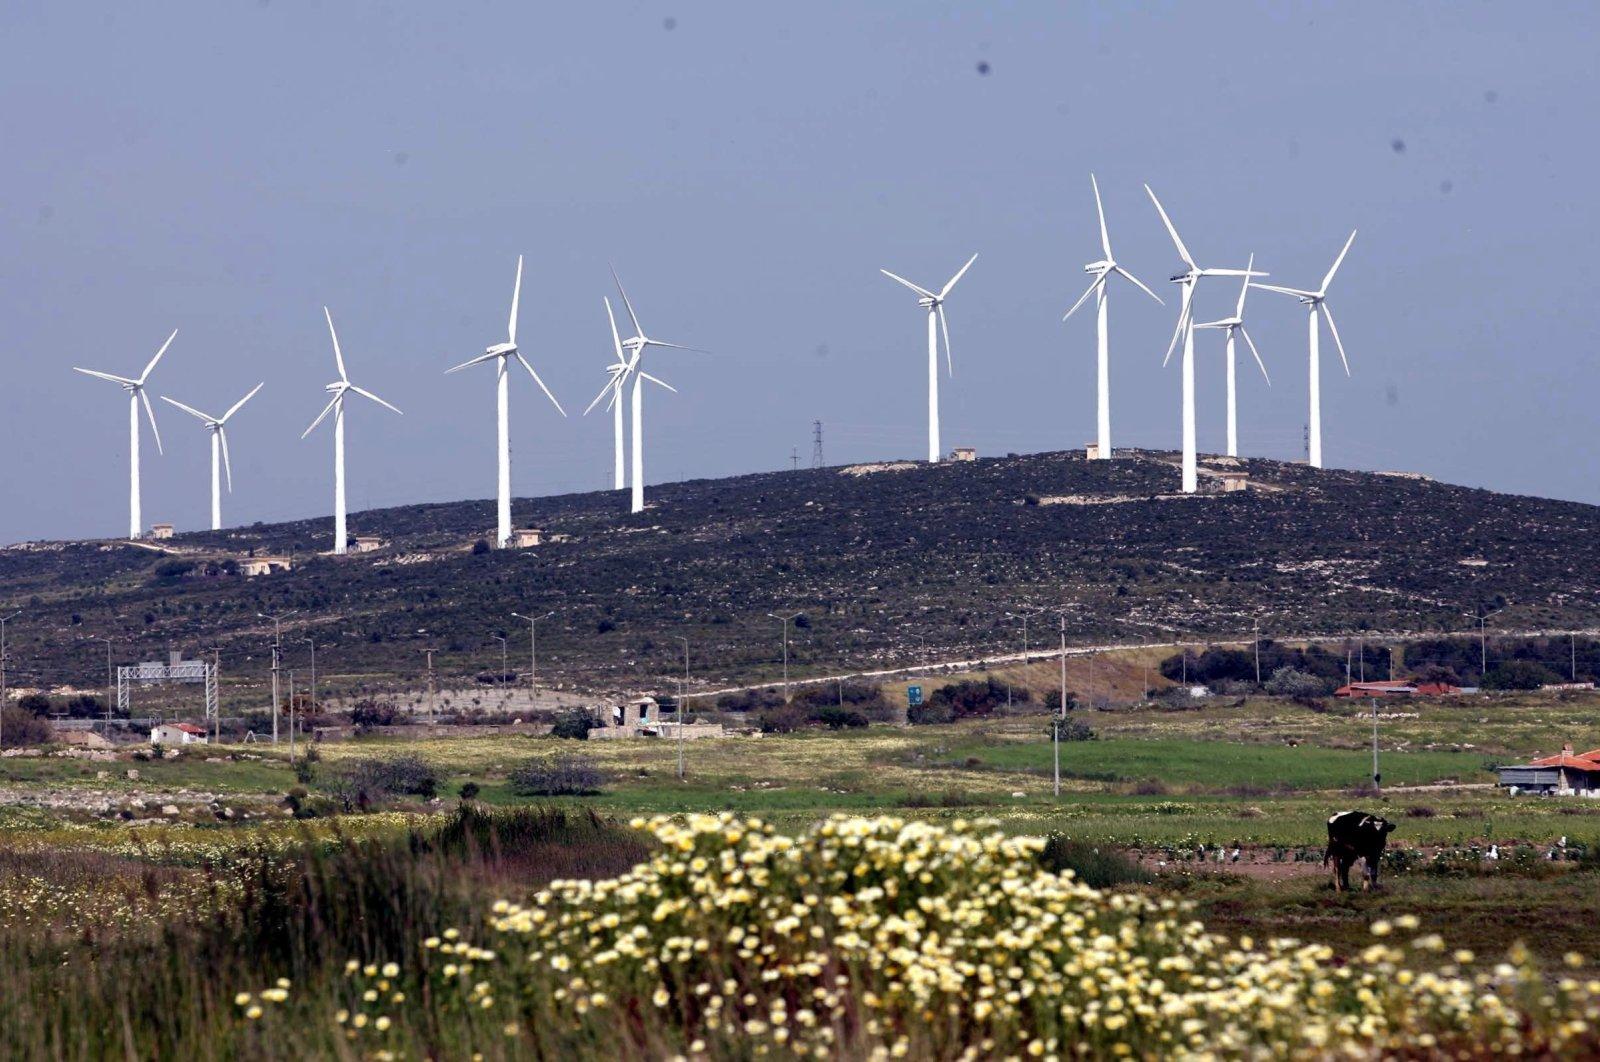 Wind turbines are seen in the Karaburun district of Turkey's Aegean province of Izmir, Feb. 13, 2019. (DHA Photo)